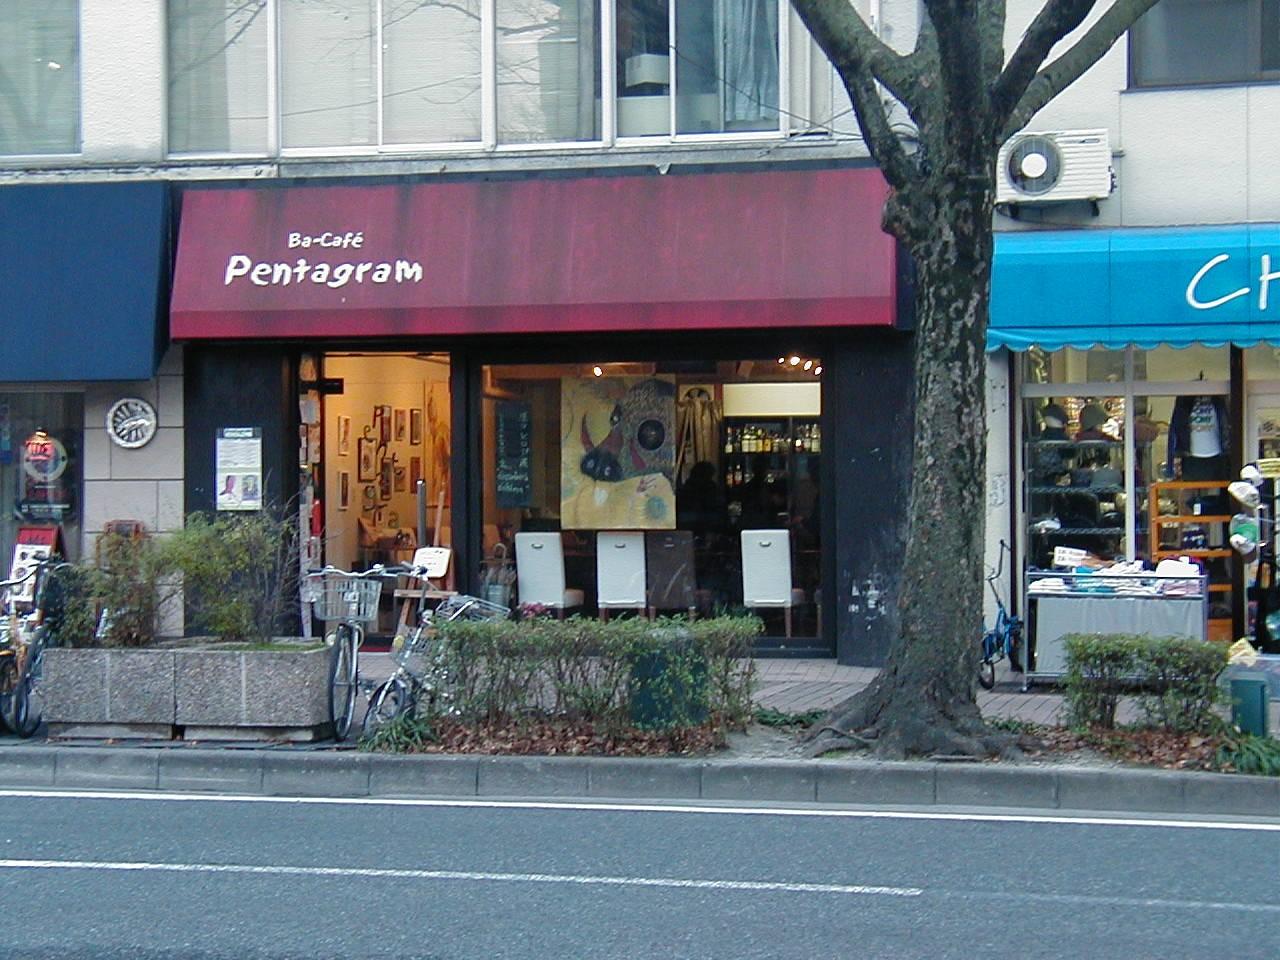 Ba-cafe Pentagram(バッカフェ ペンタグラム)